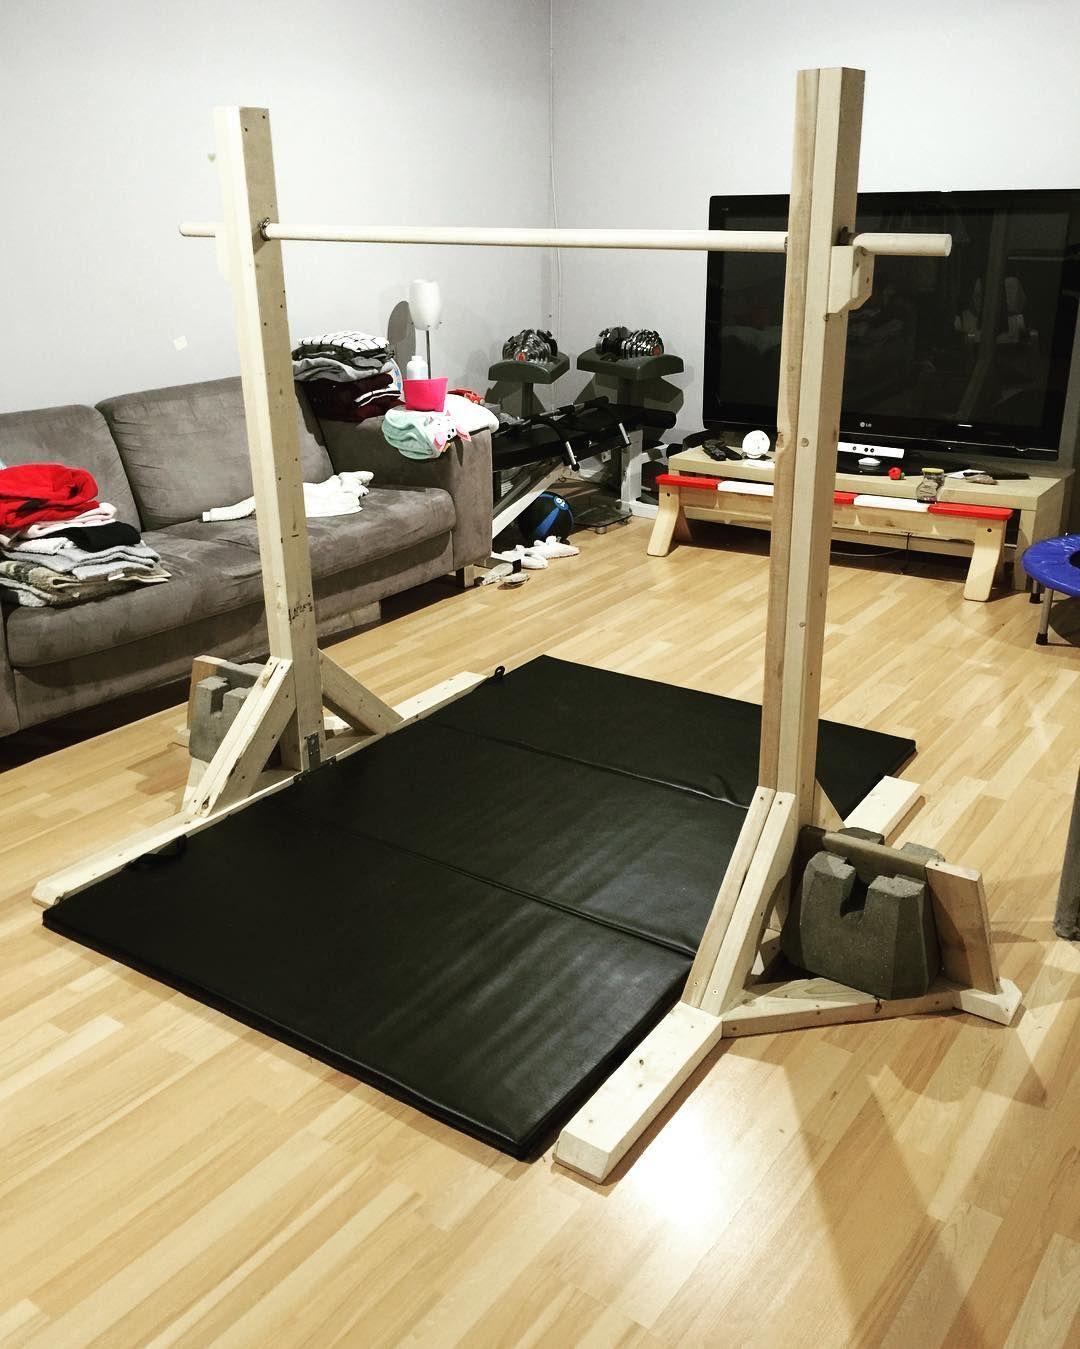 Pin By Louise Dion On Gymnastics Gymnastics Gymnastics Equipment